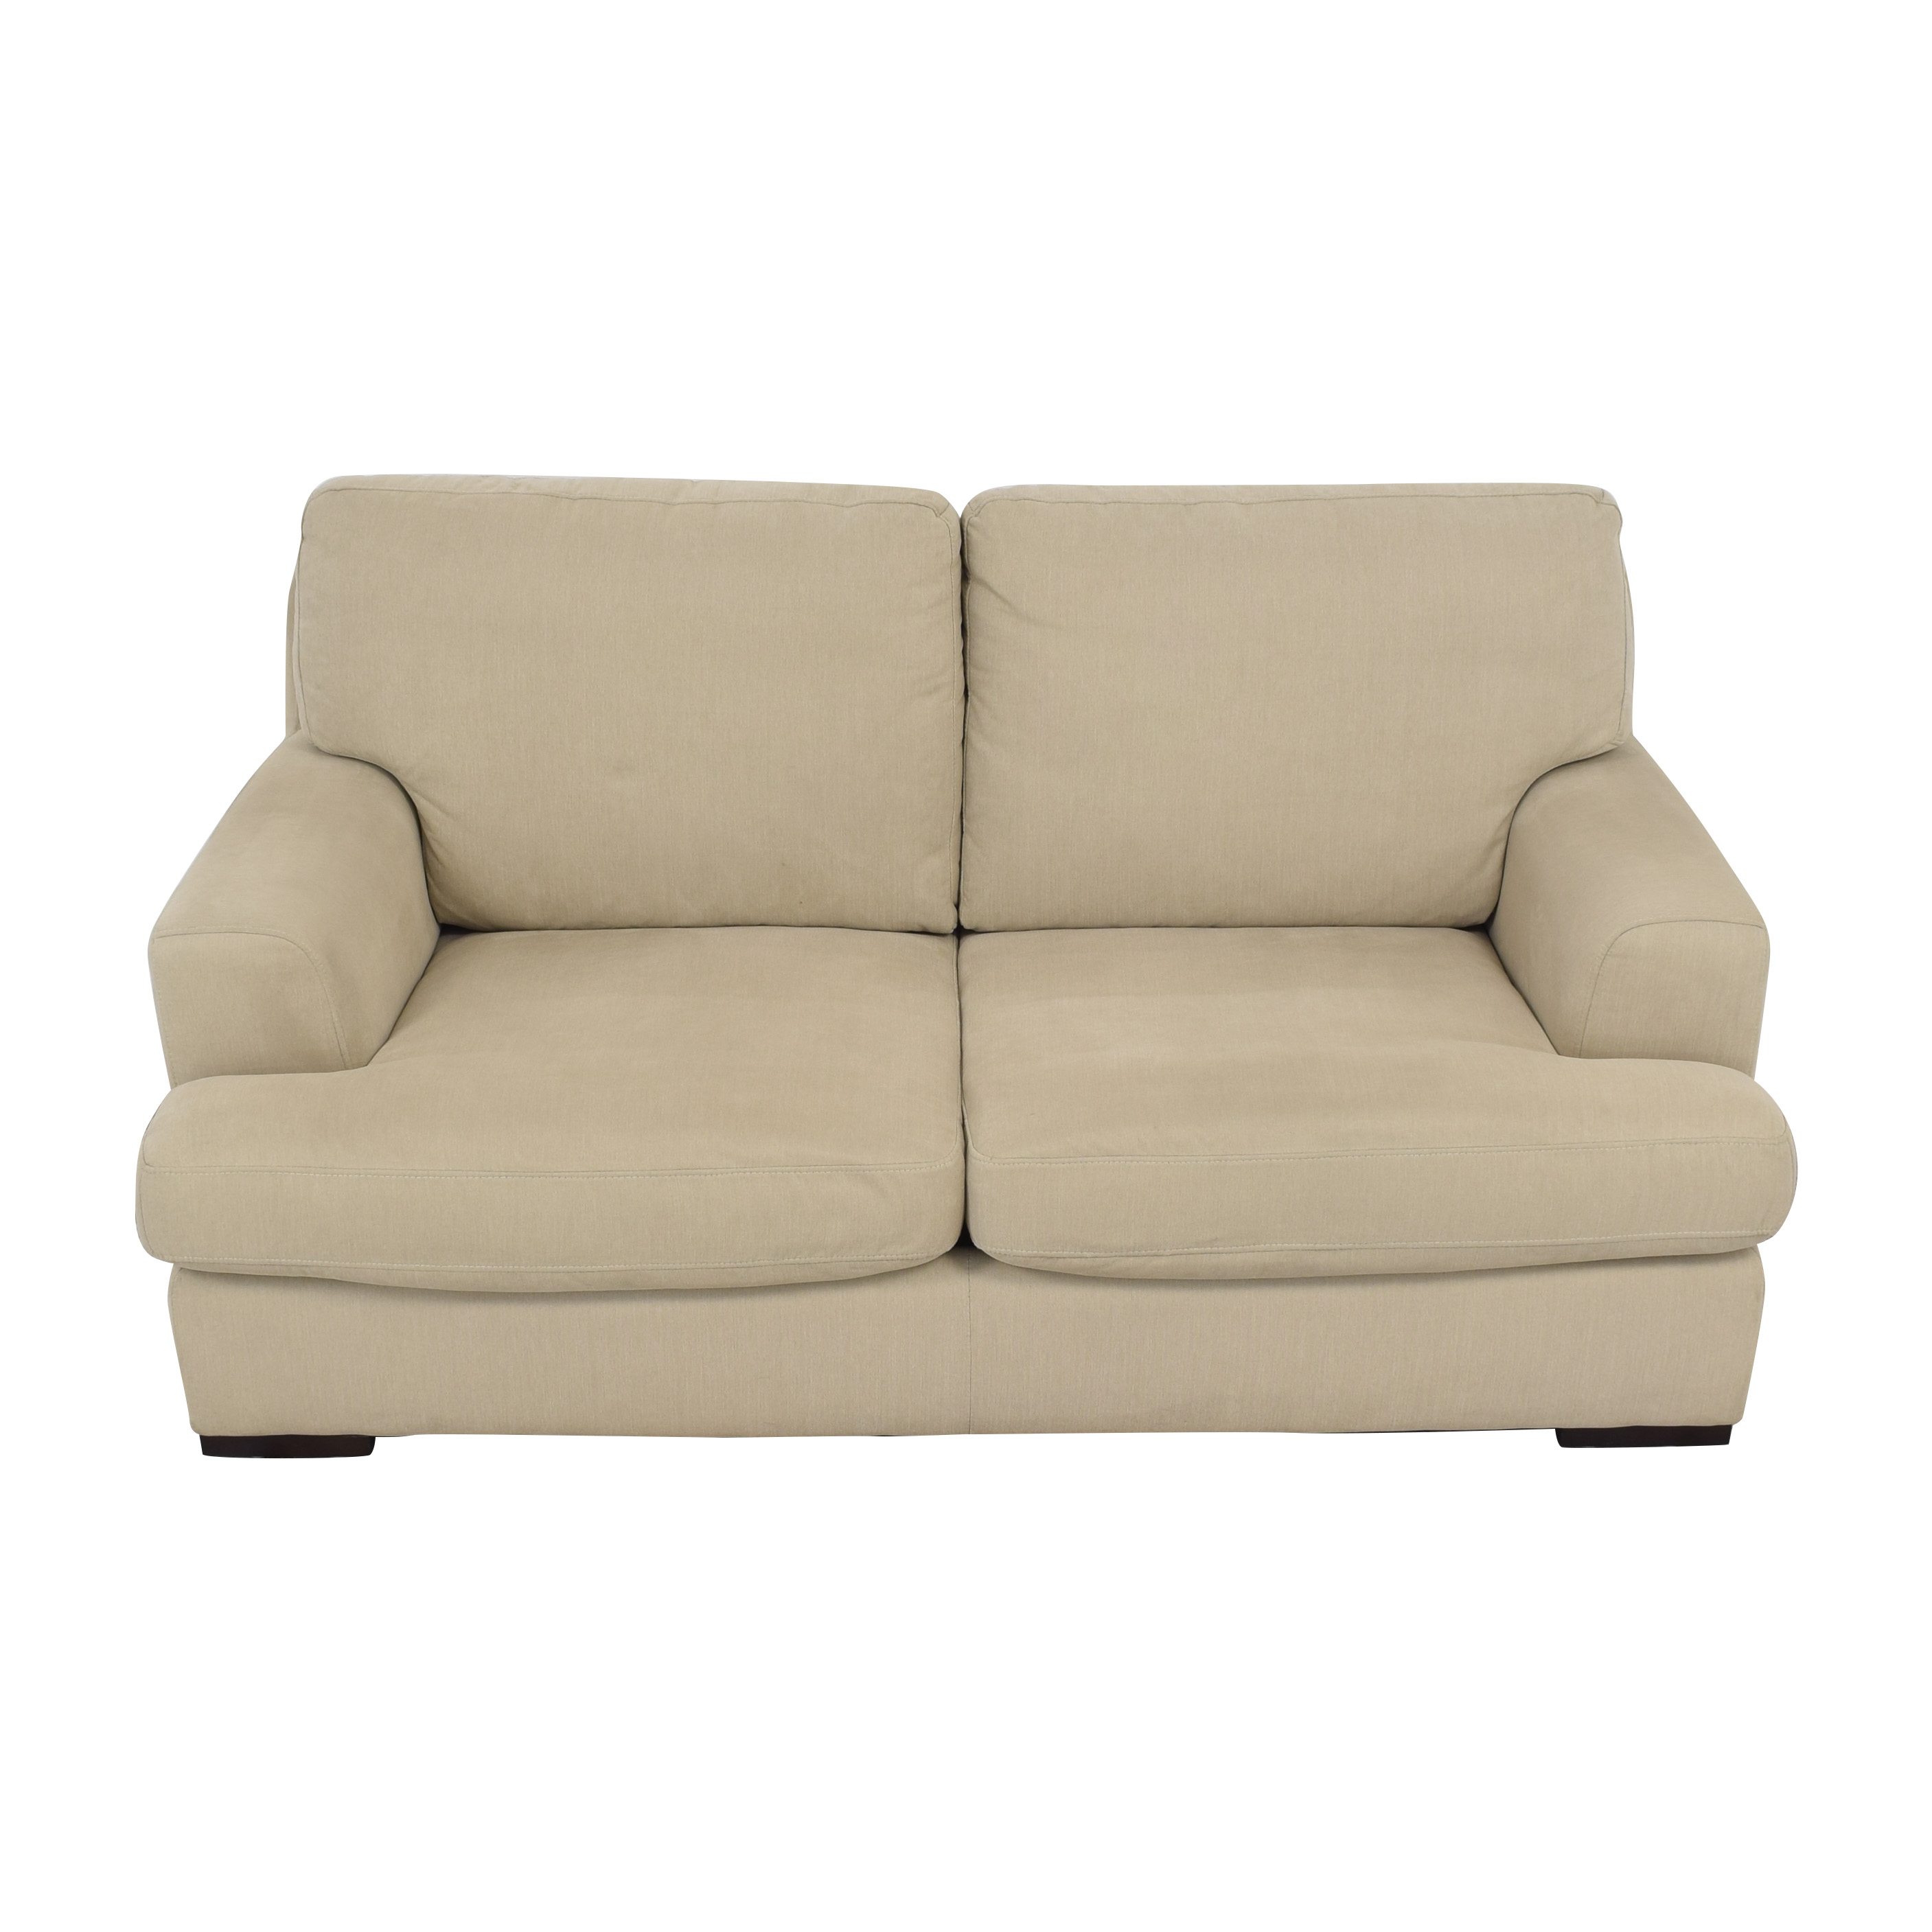 Stone & Beam Stone & Beam Lauren Down-Filled Oversized Sofa Sofas